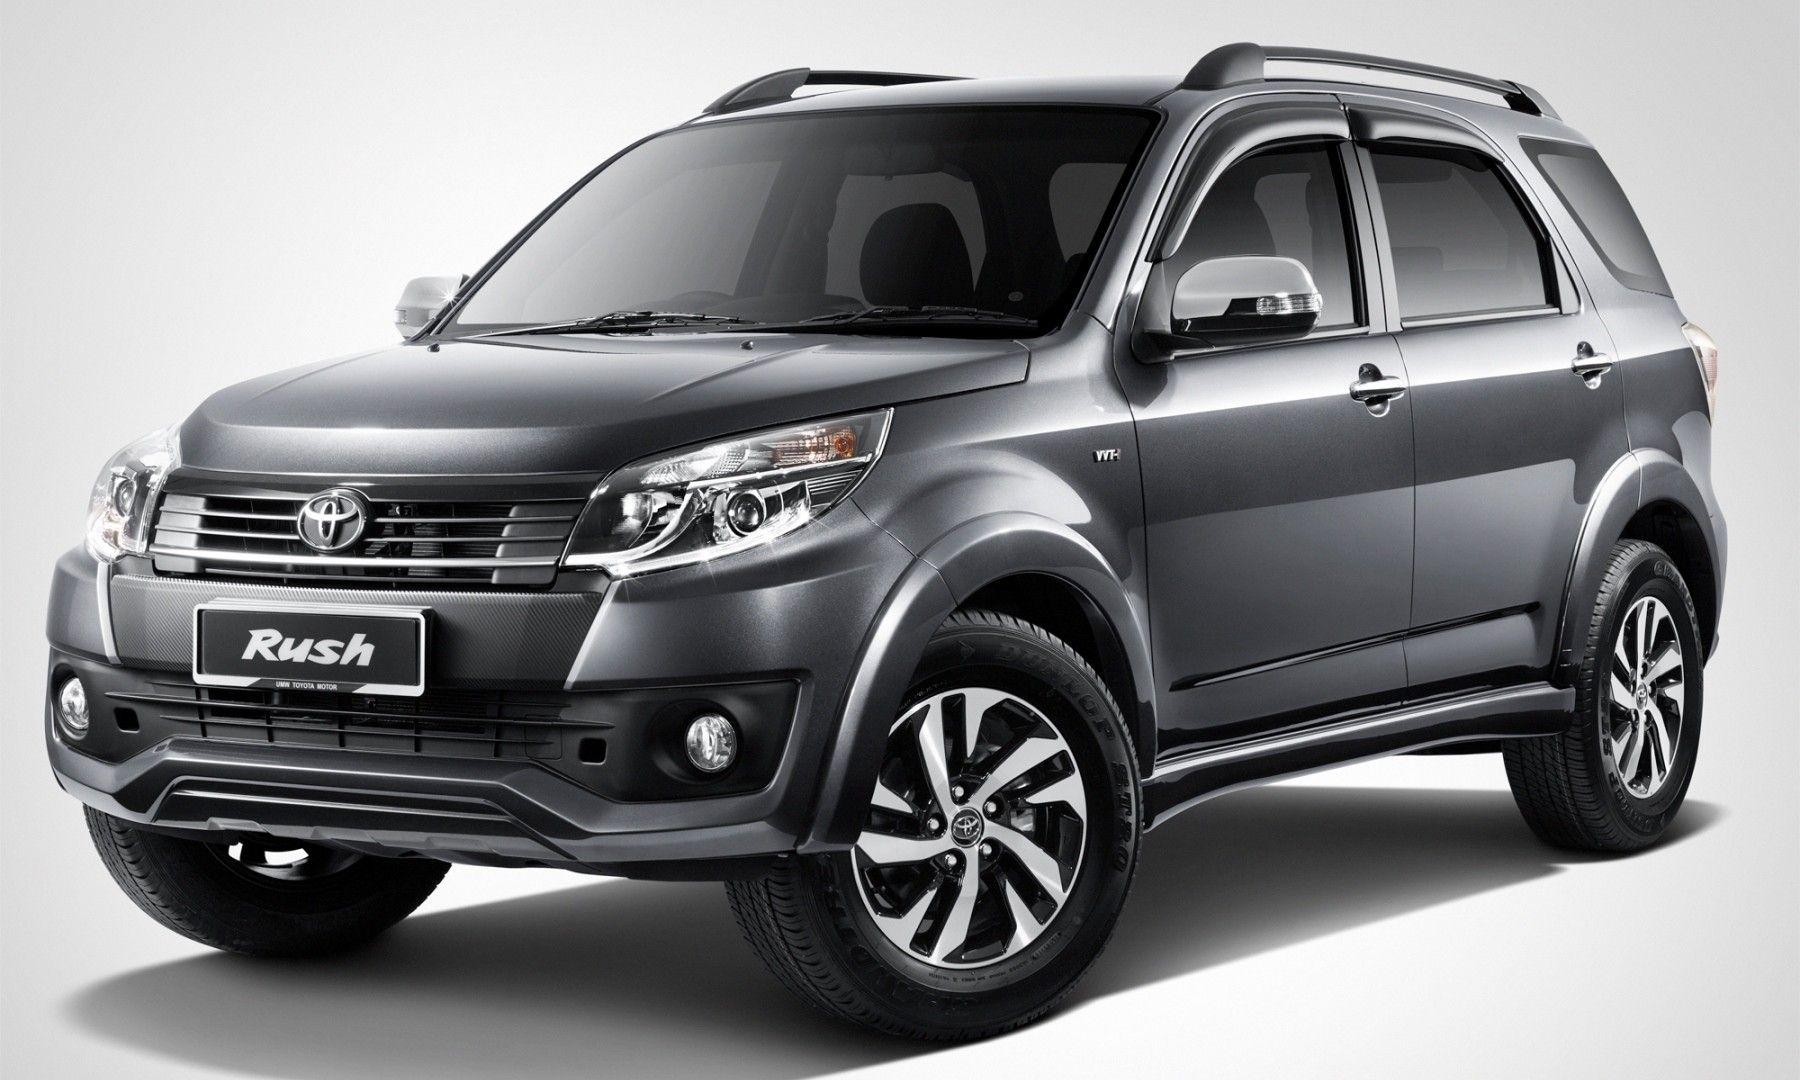 2016 Toyota Rush Indonesia launch price Rp 233 million